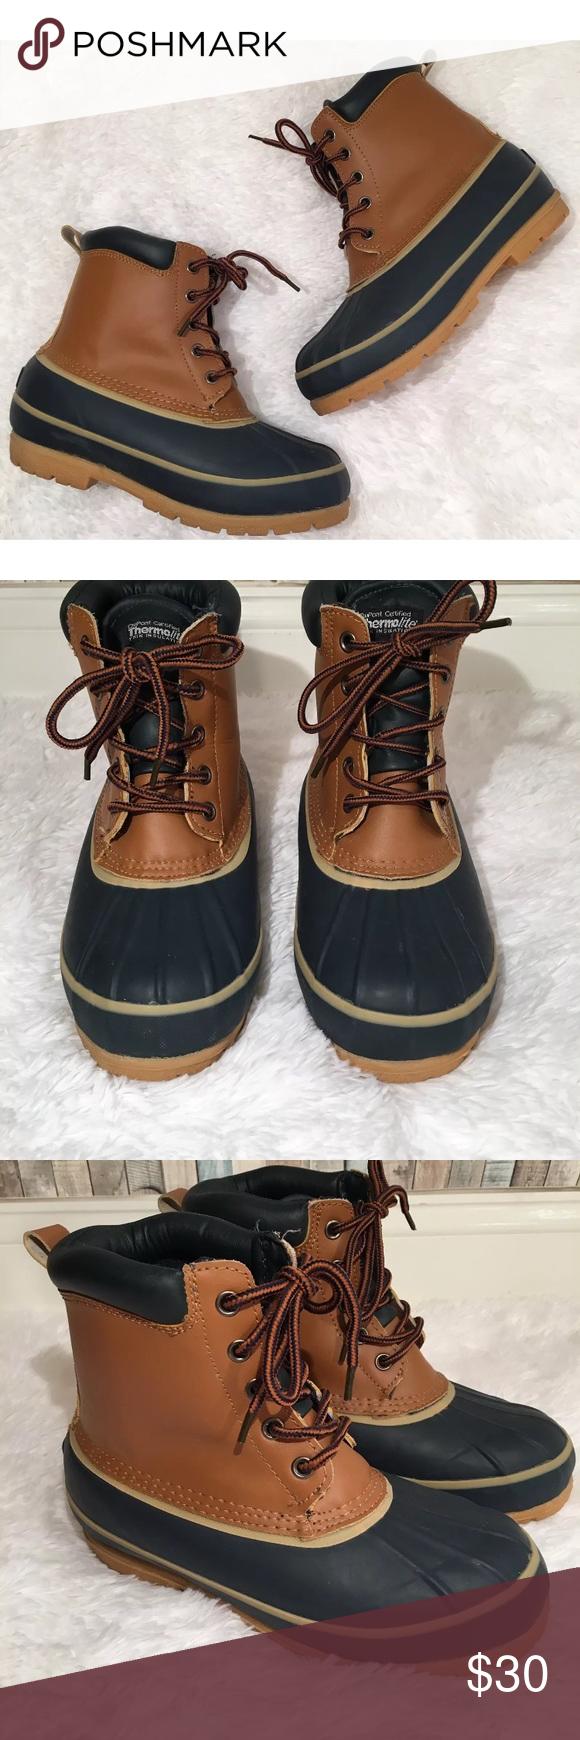 Coleman women's duck Boots Insulated